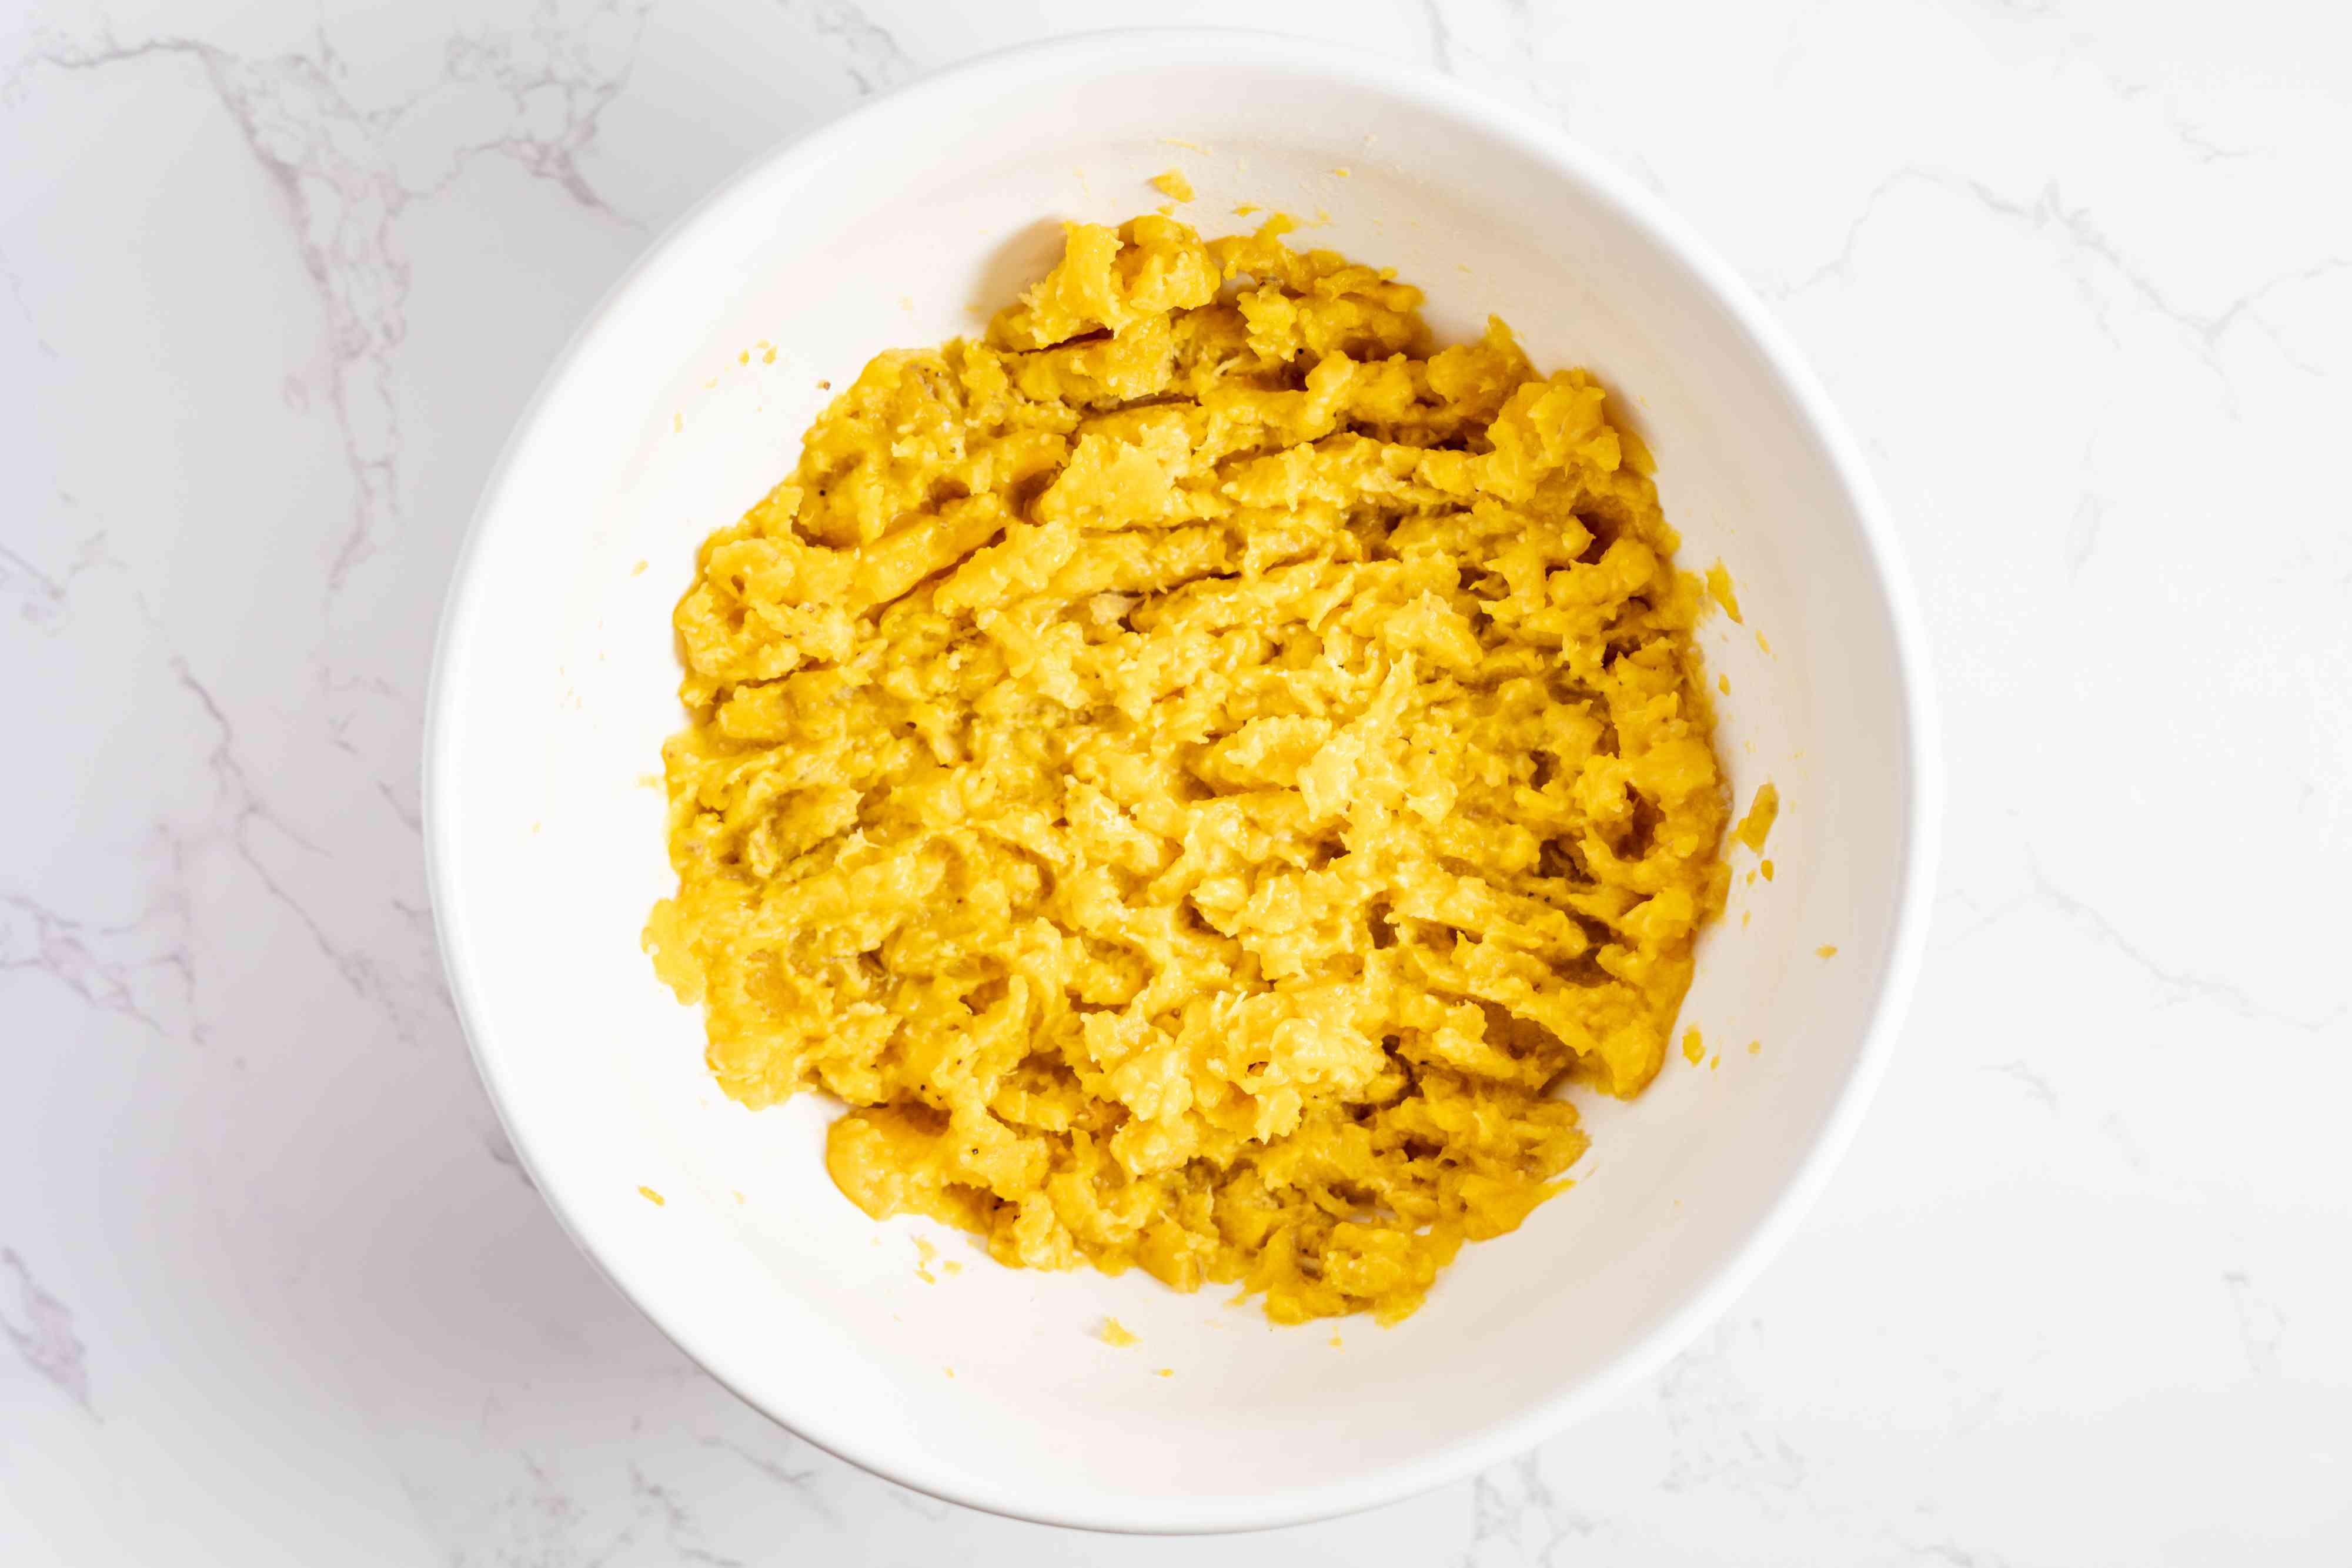 mash the plantains using a potato masher